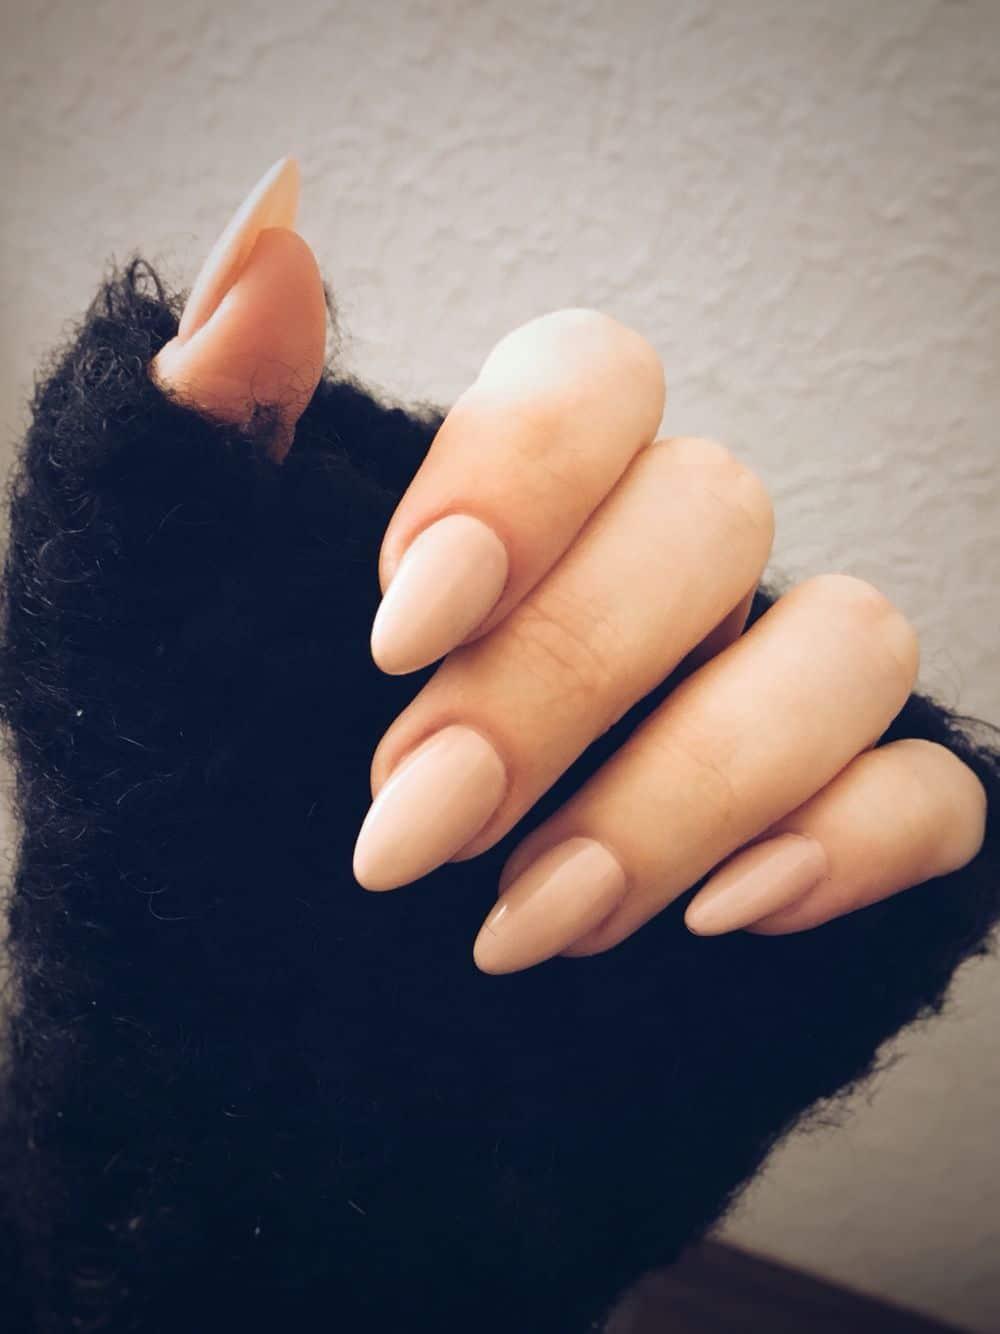 форма ногтей миндаль - пример 1